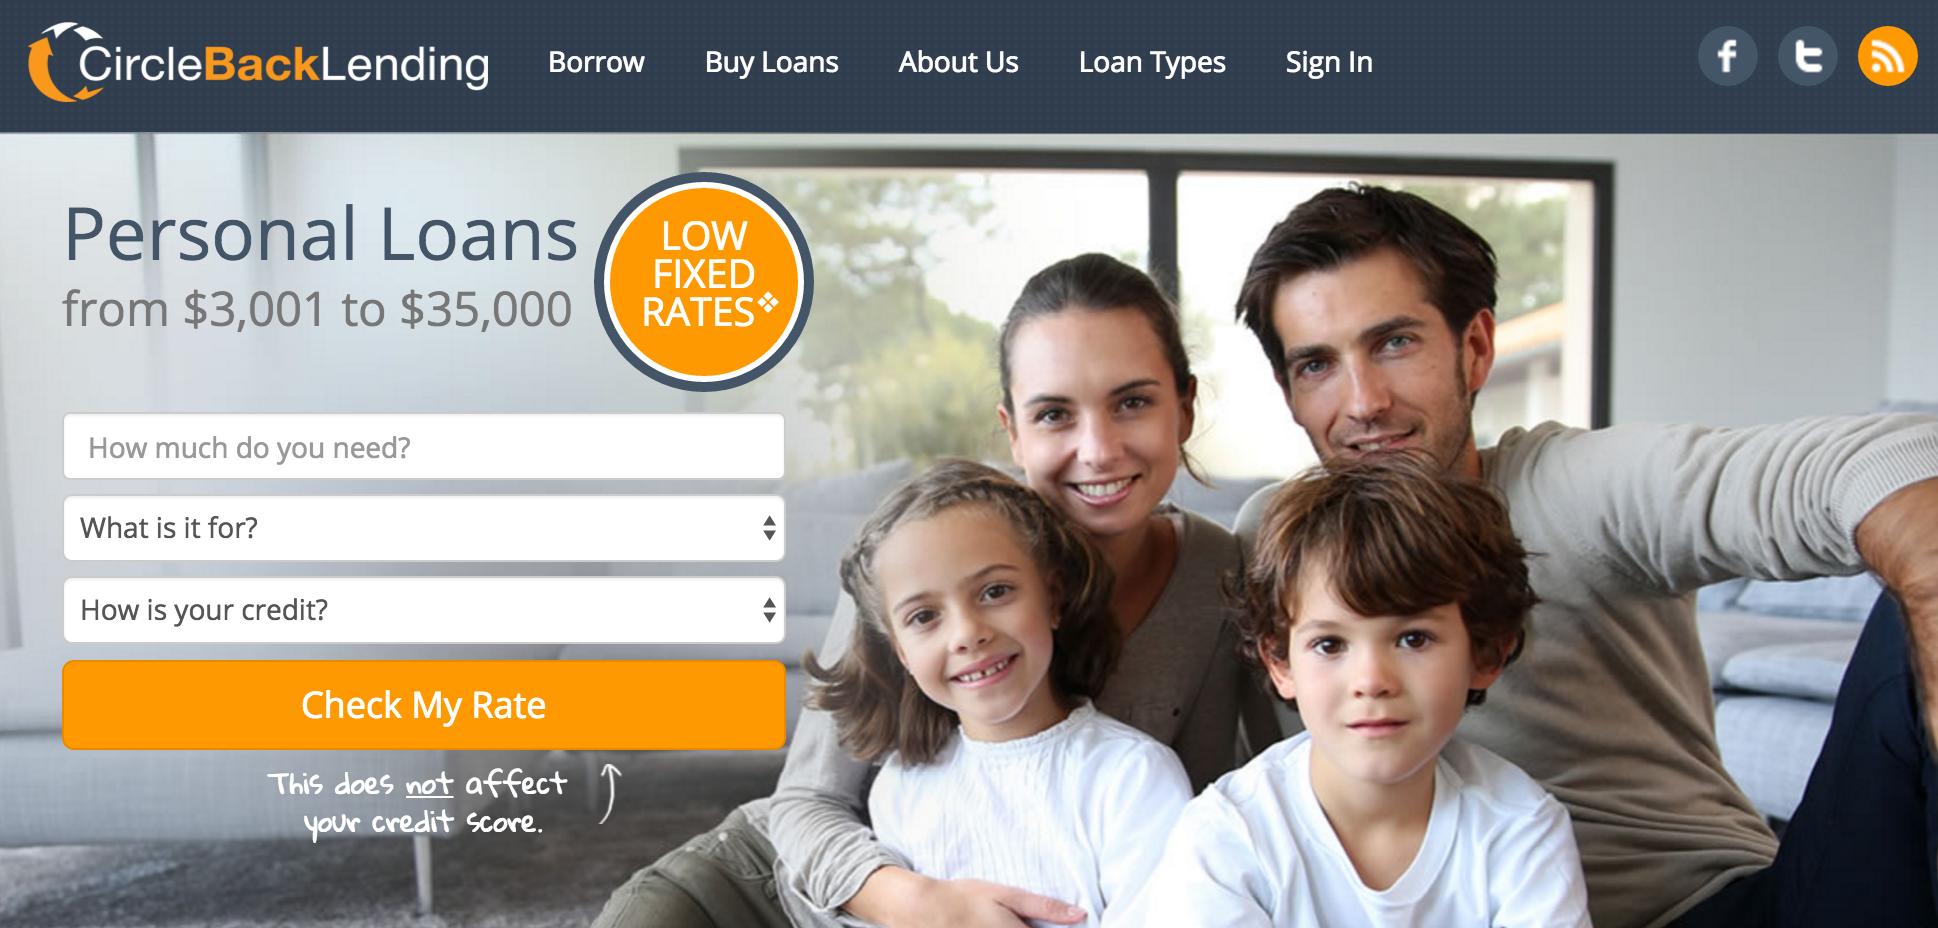 circlebacklending personal loans